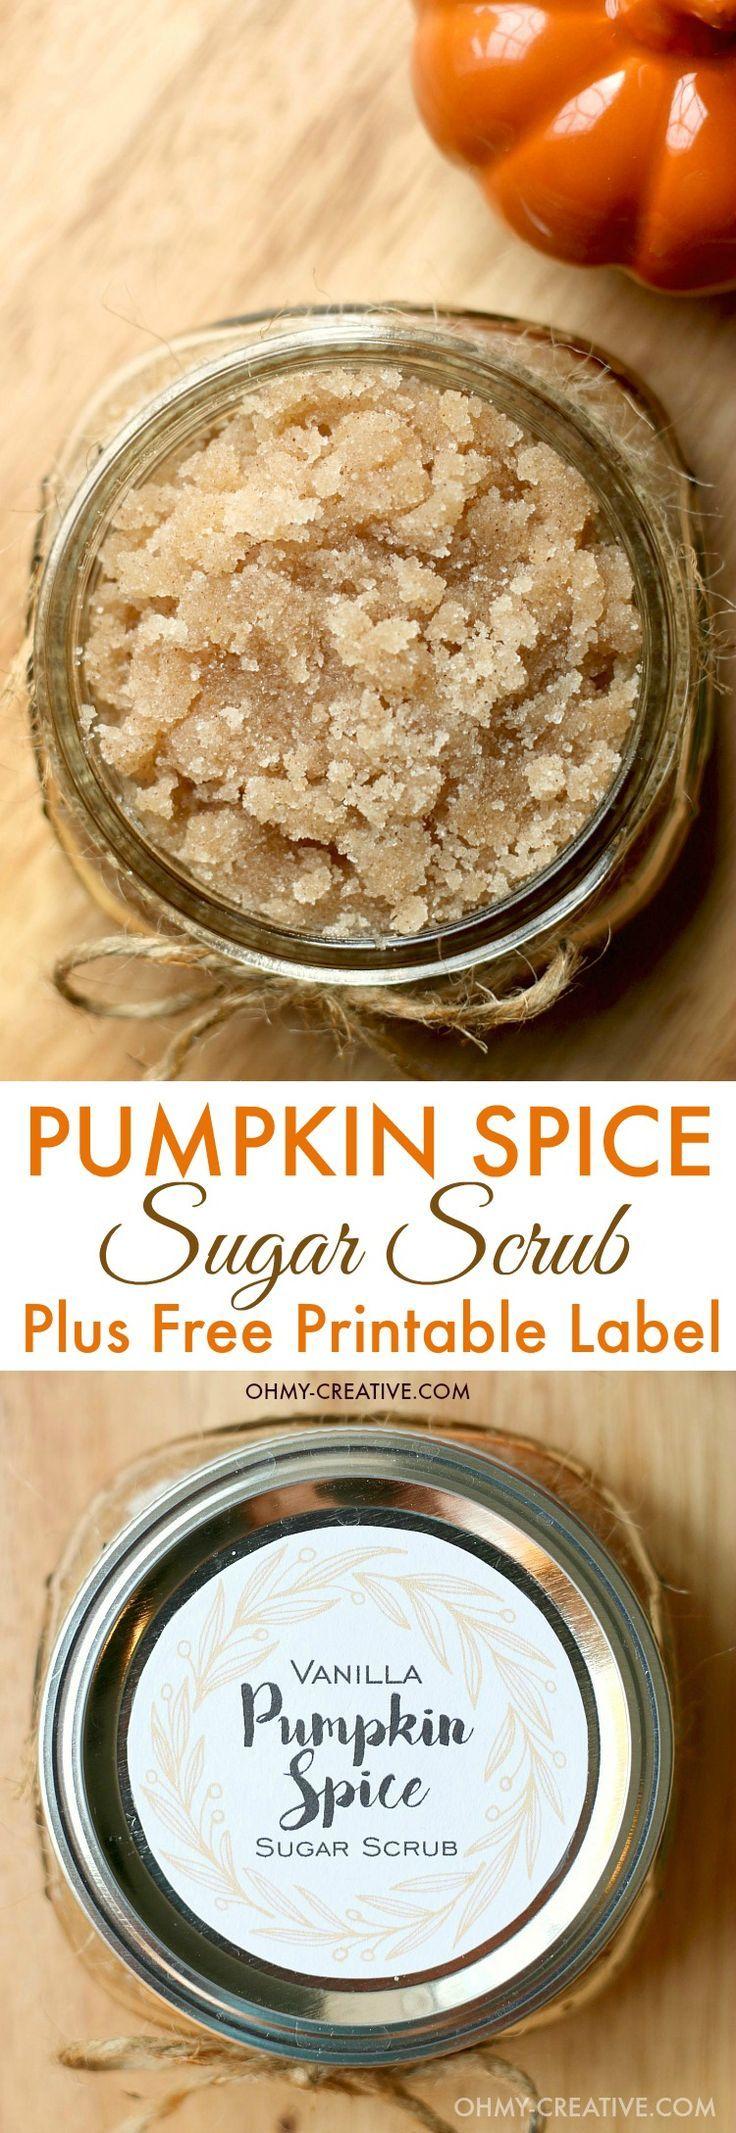 vanilla pumpkin spice sugar scrub free printable label | printable